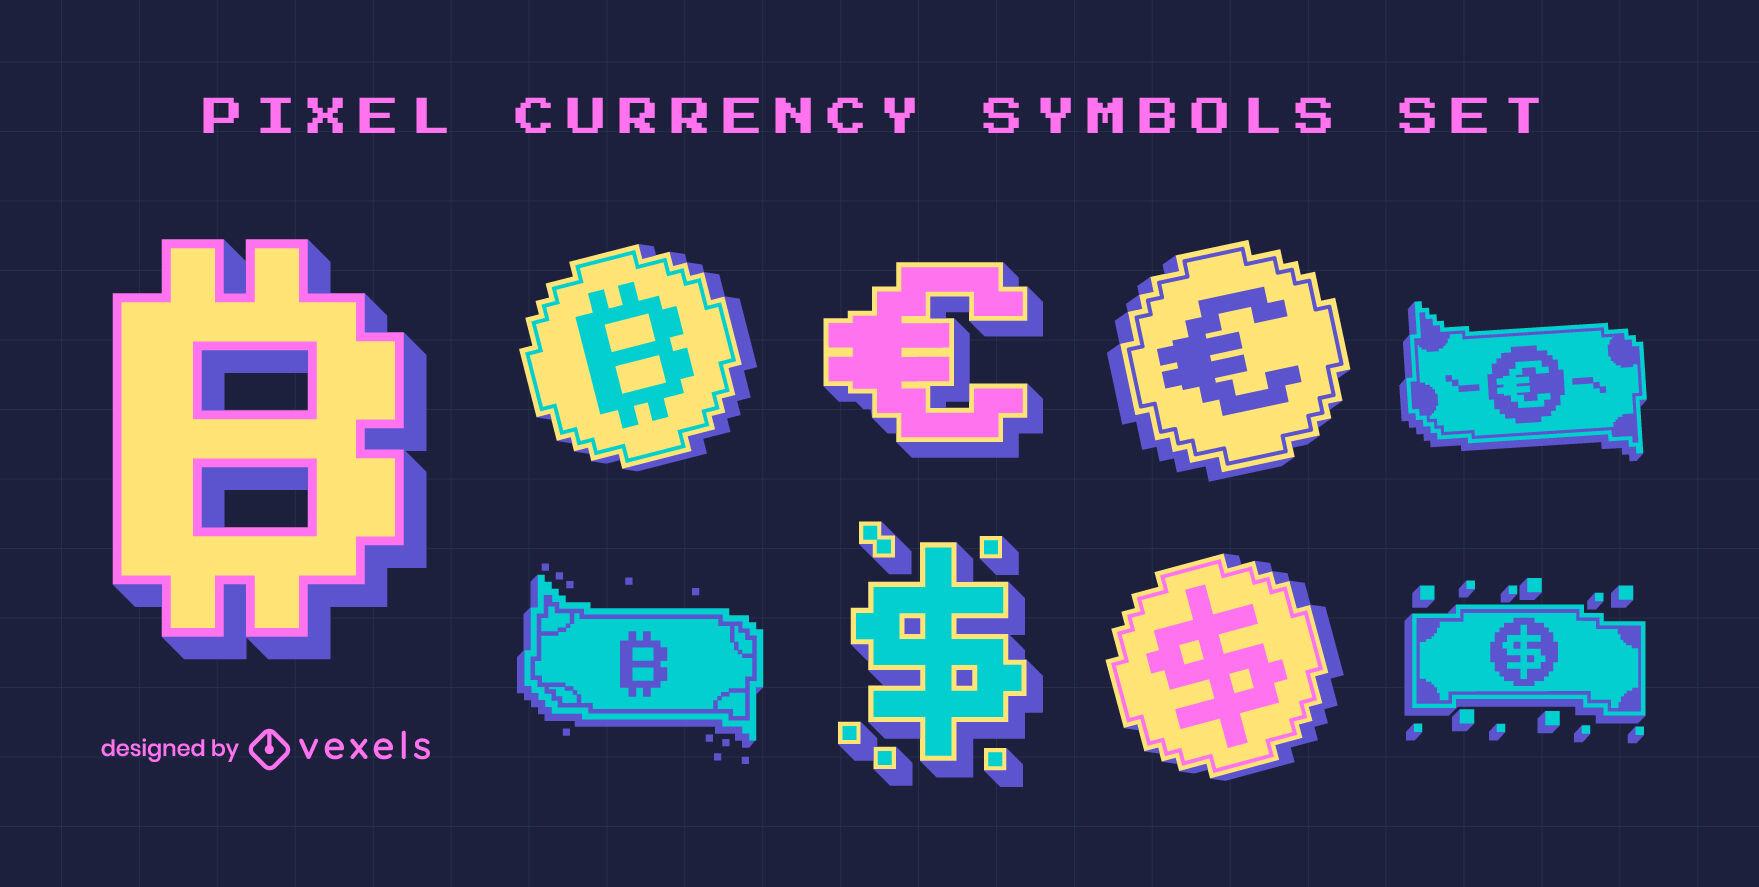 Währungssymbole Farbpixel-Art-Set